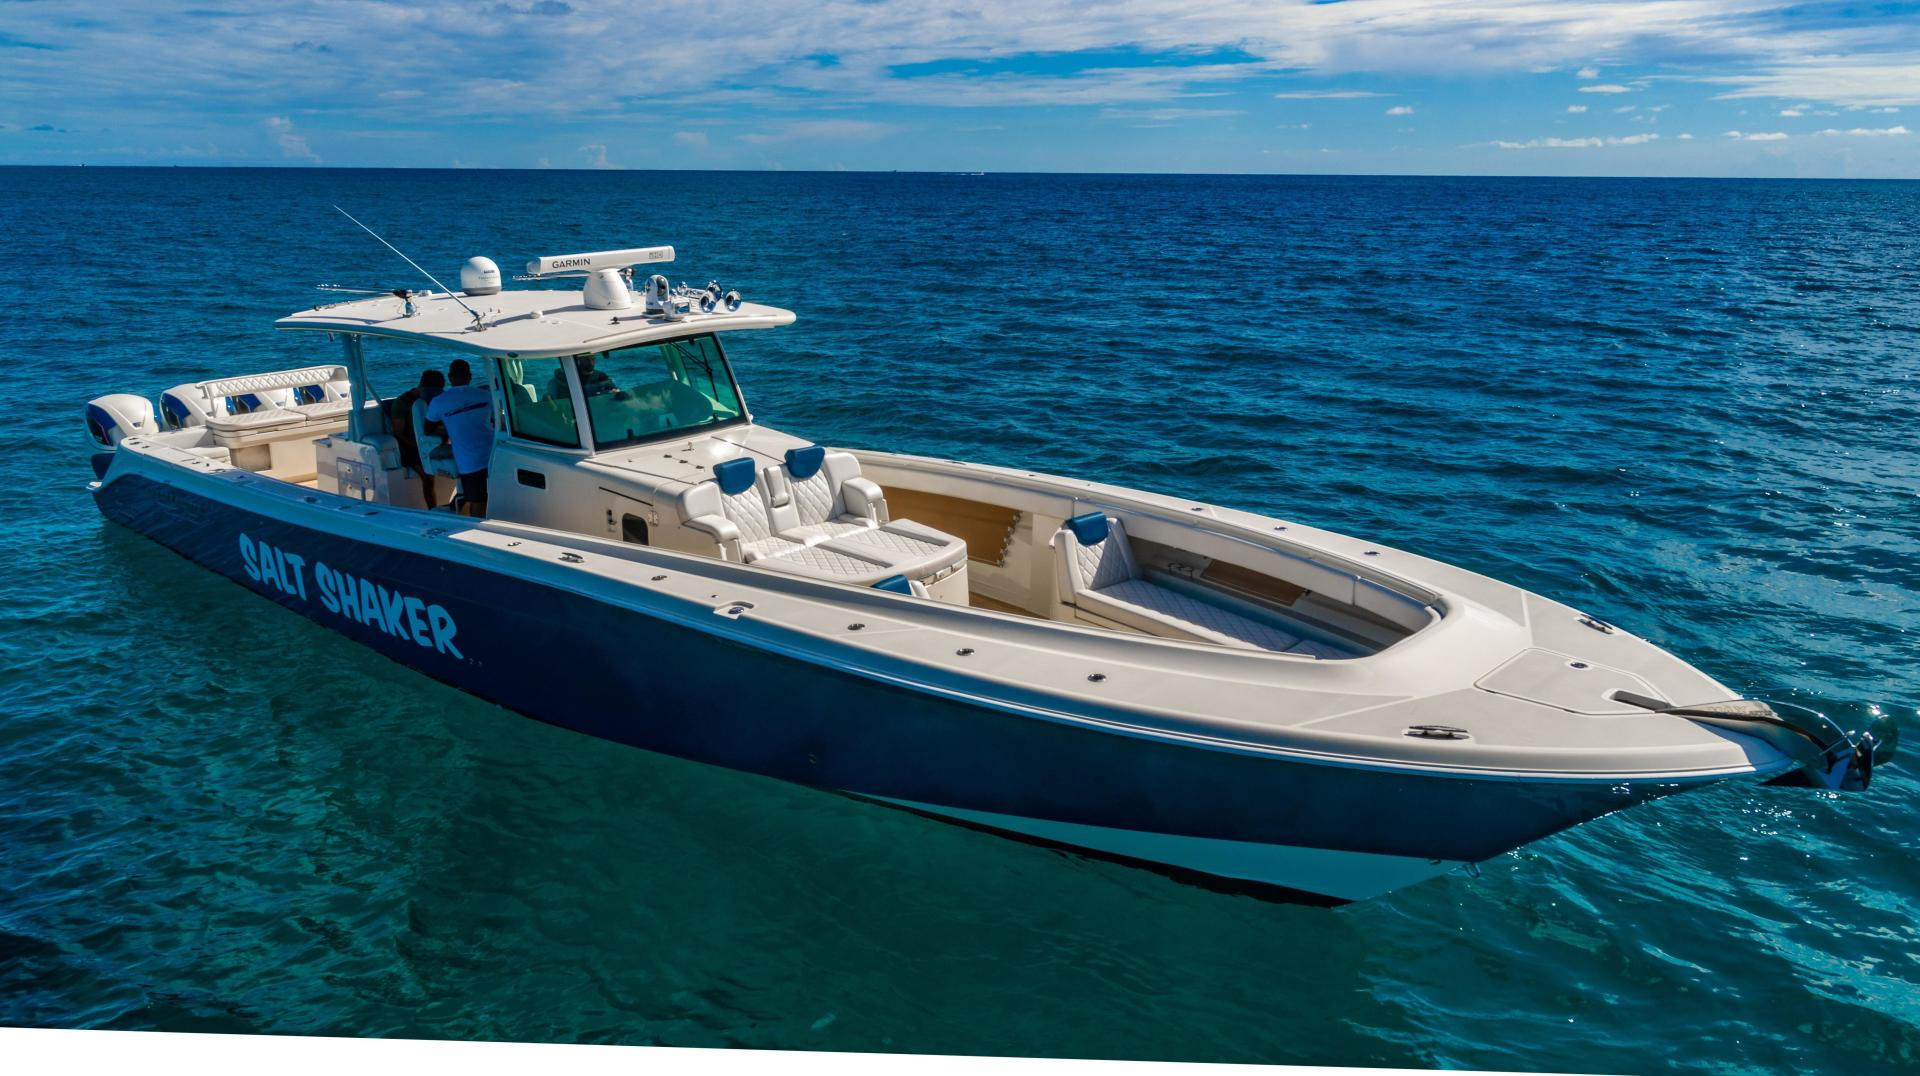 HCB-Suenos 2016-Salt Shaker Ft. Lauderdale-Florida-United States-1548624 | Thumbnail